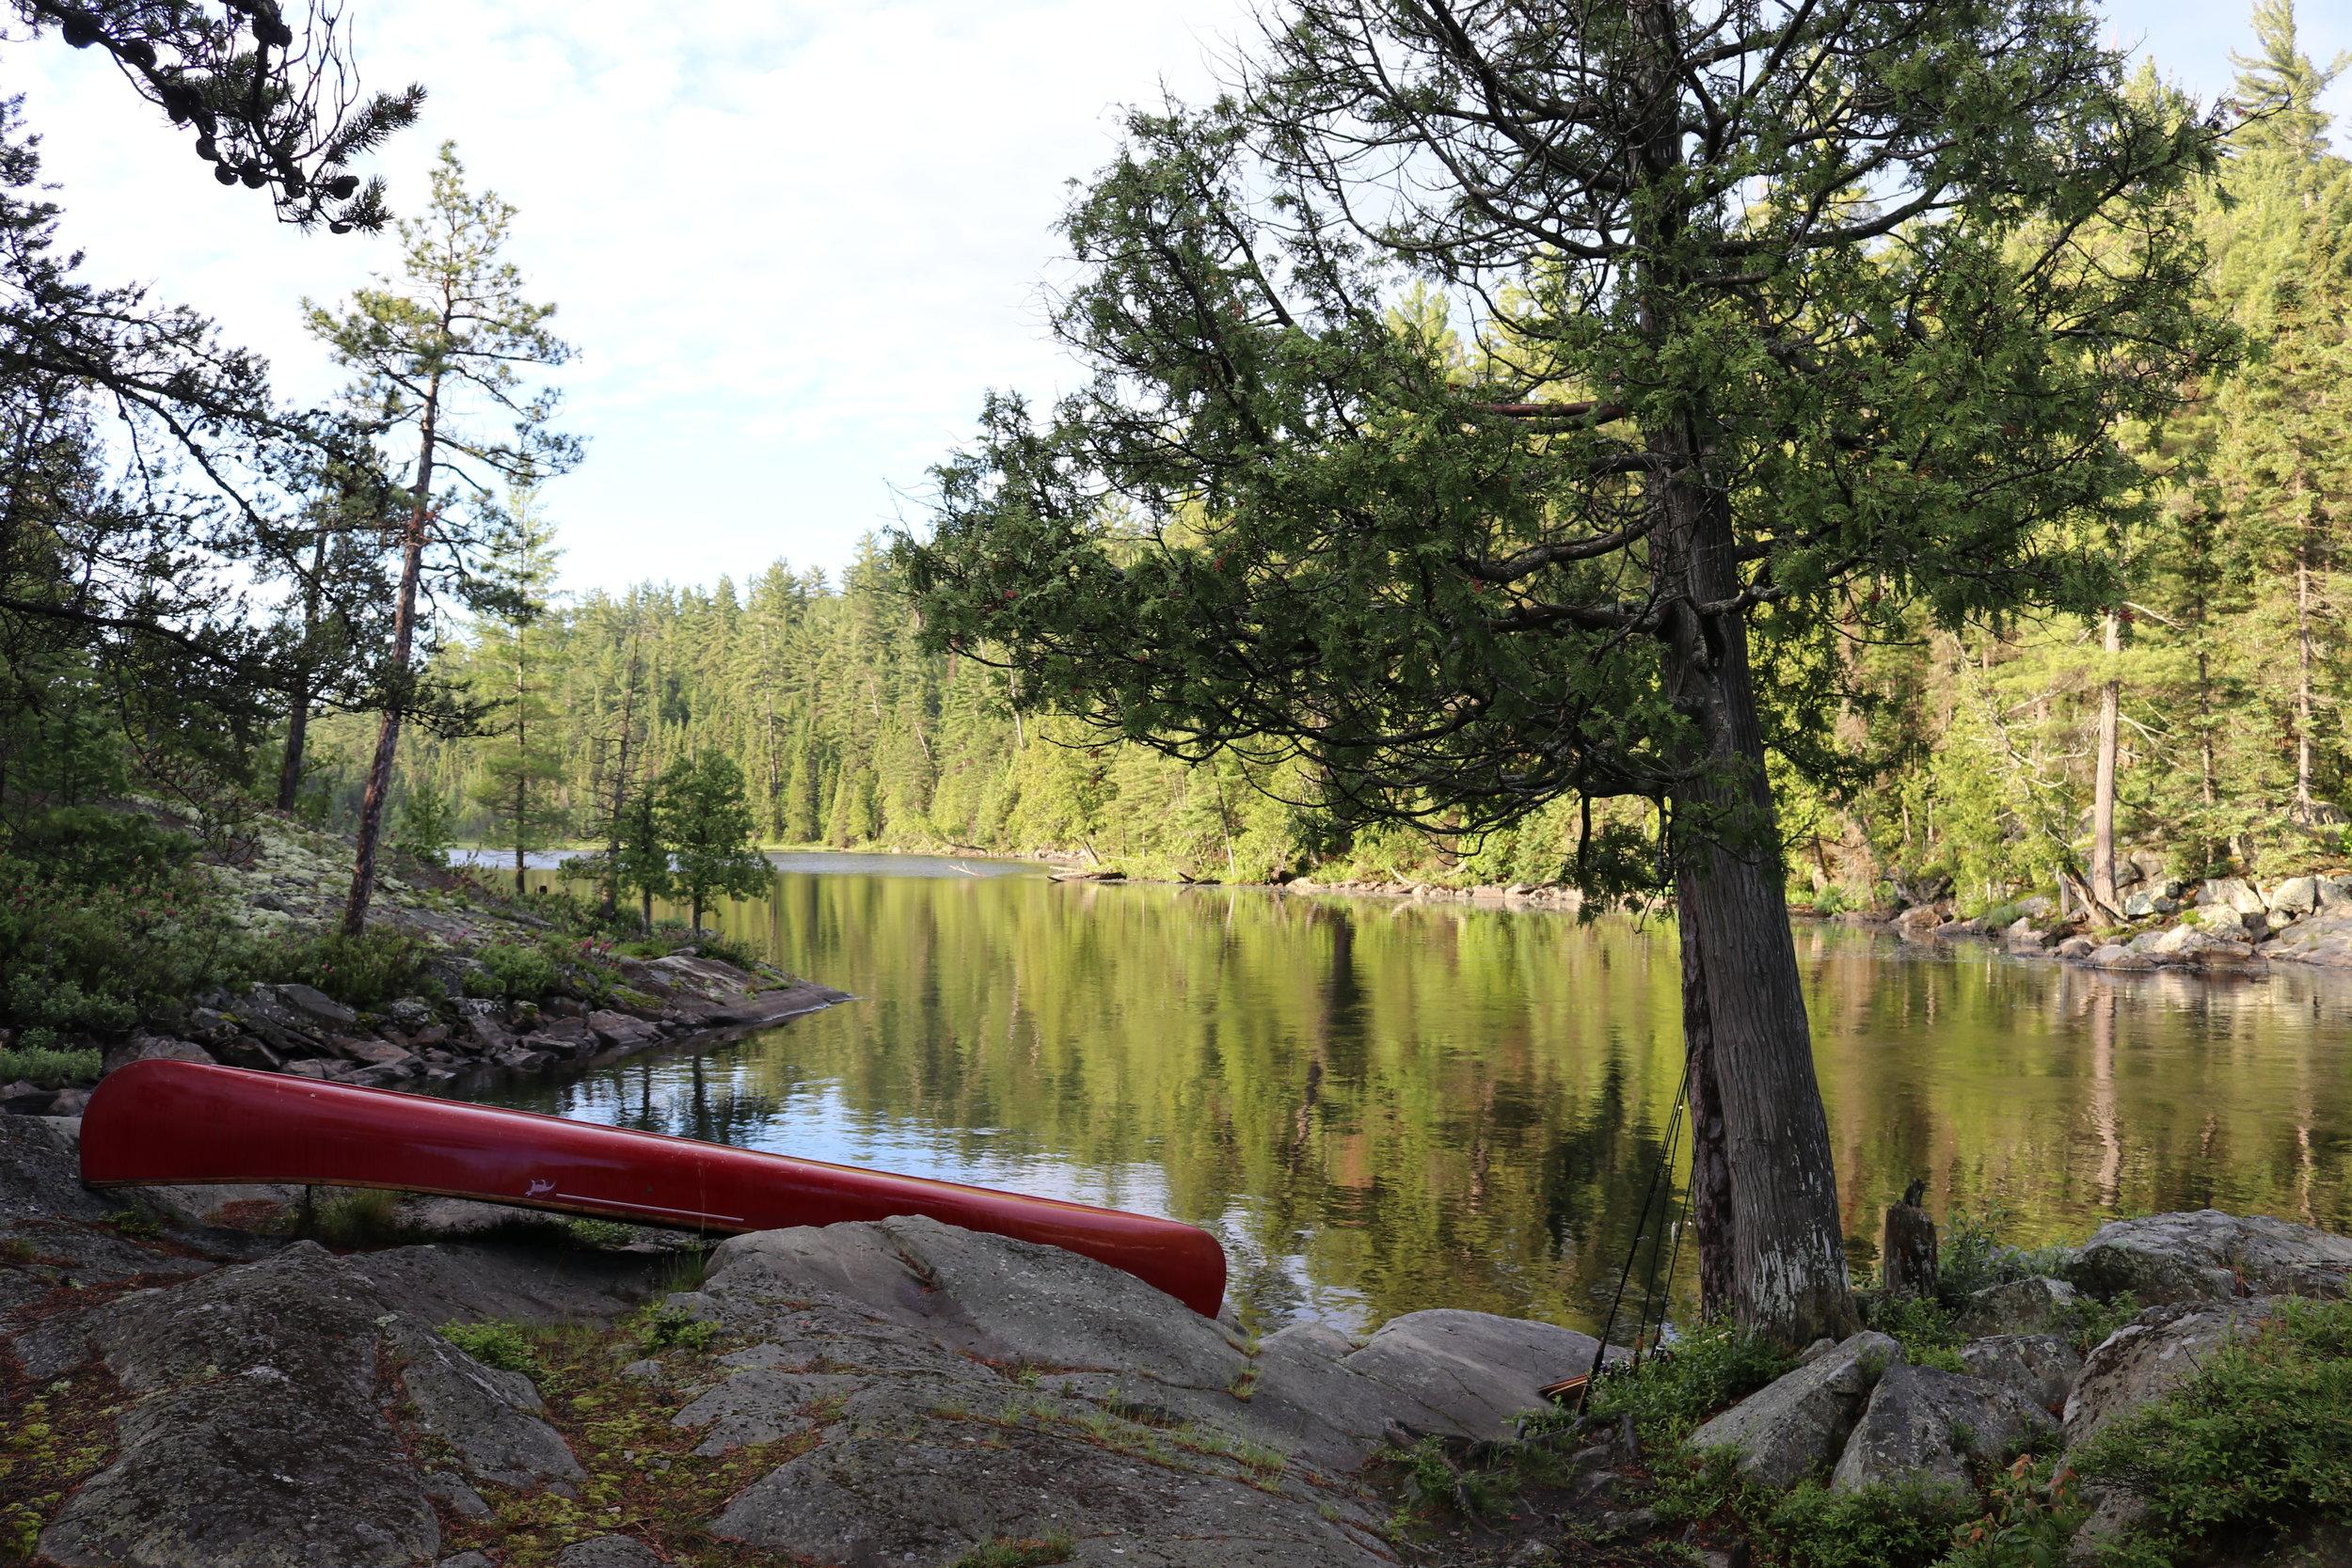 Camp #2 - Beautiful morning at Helen Falls